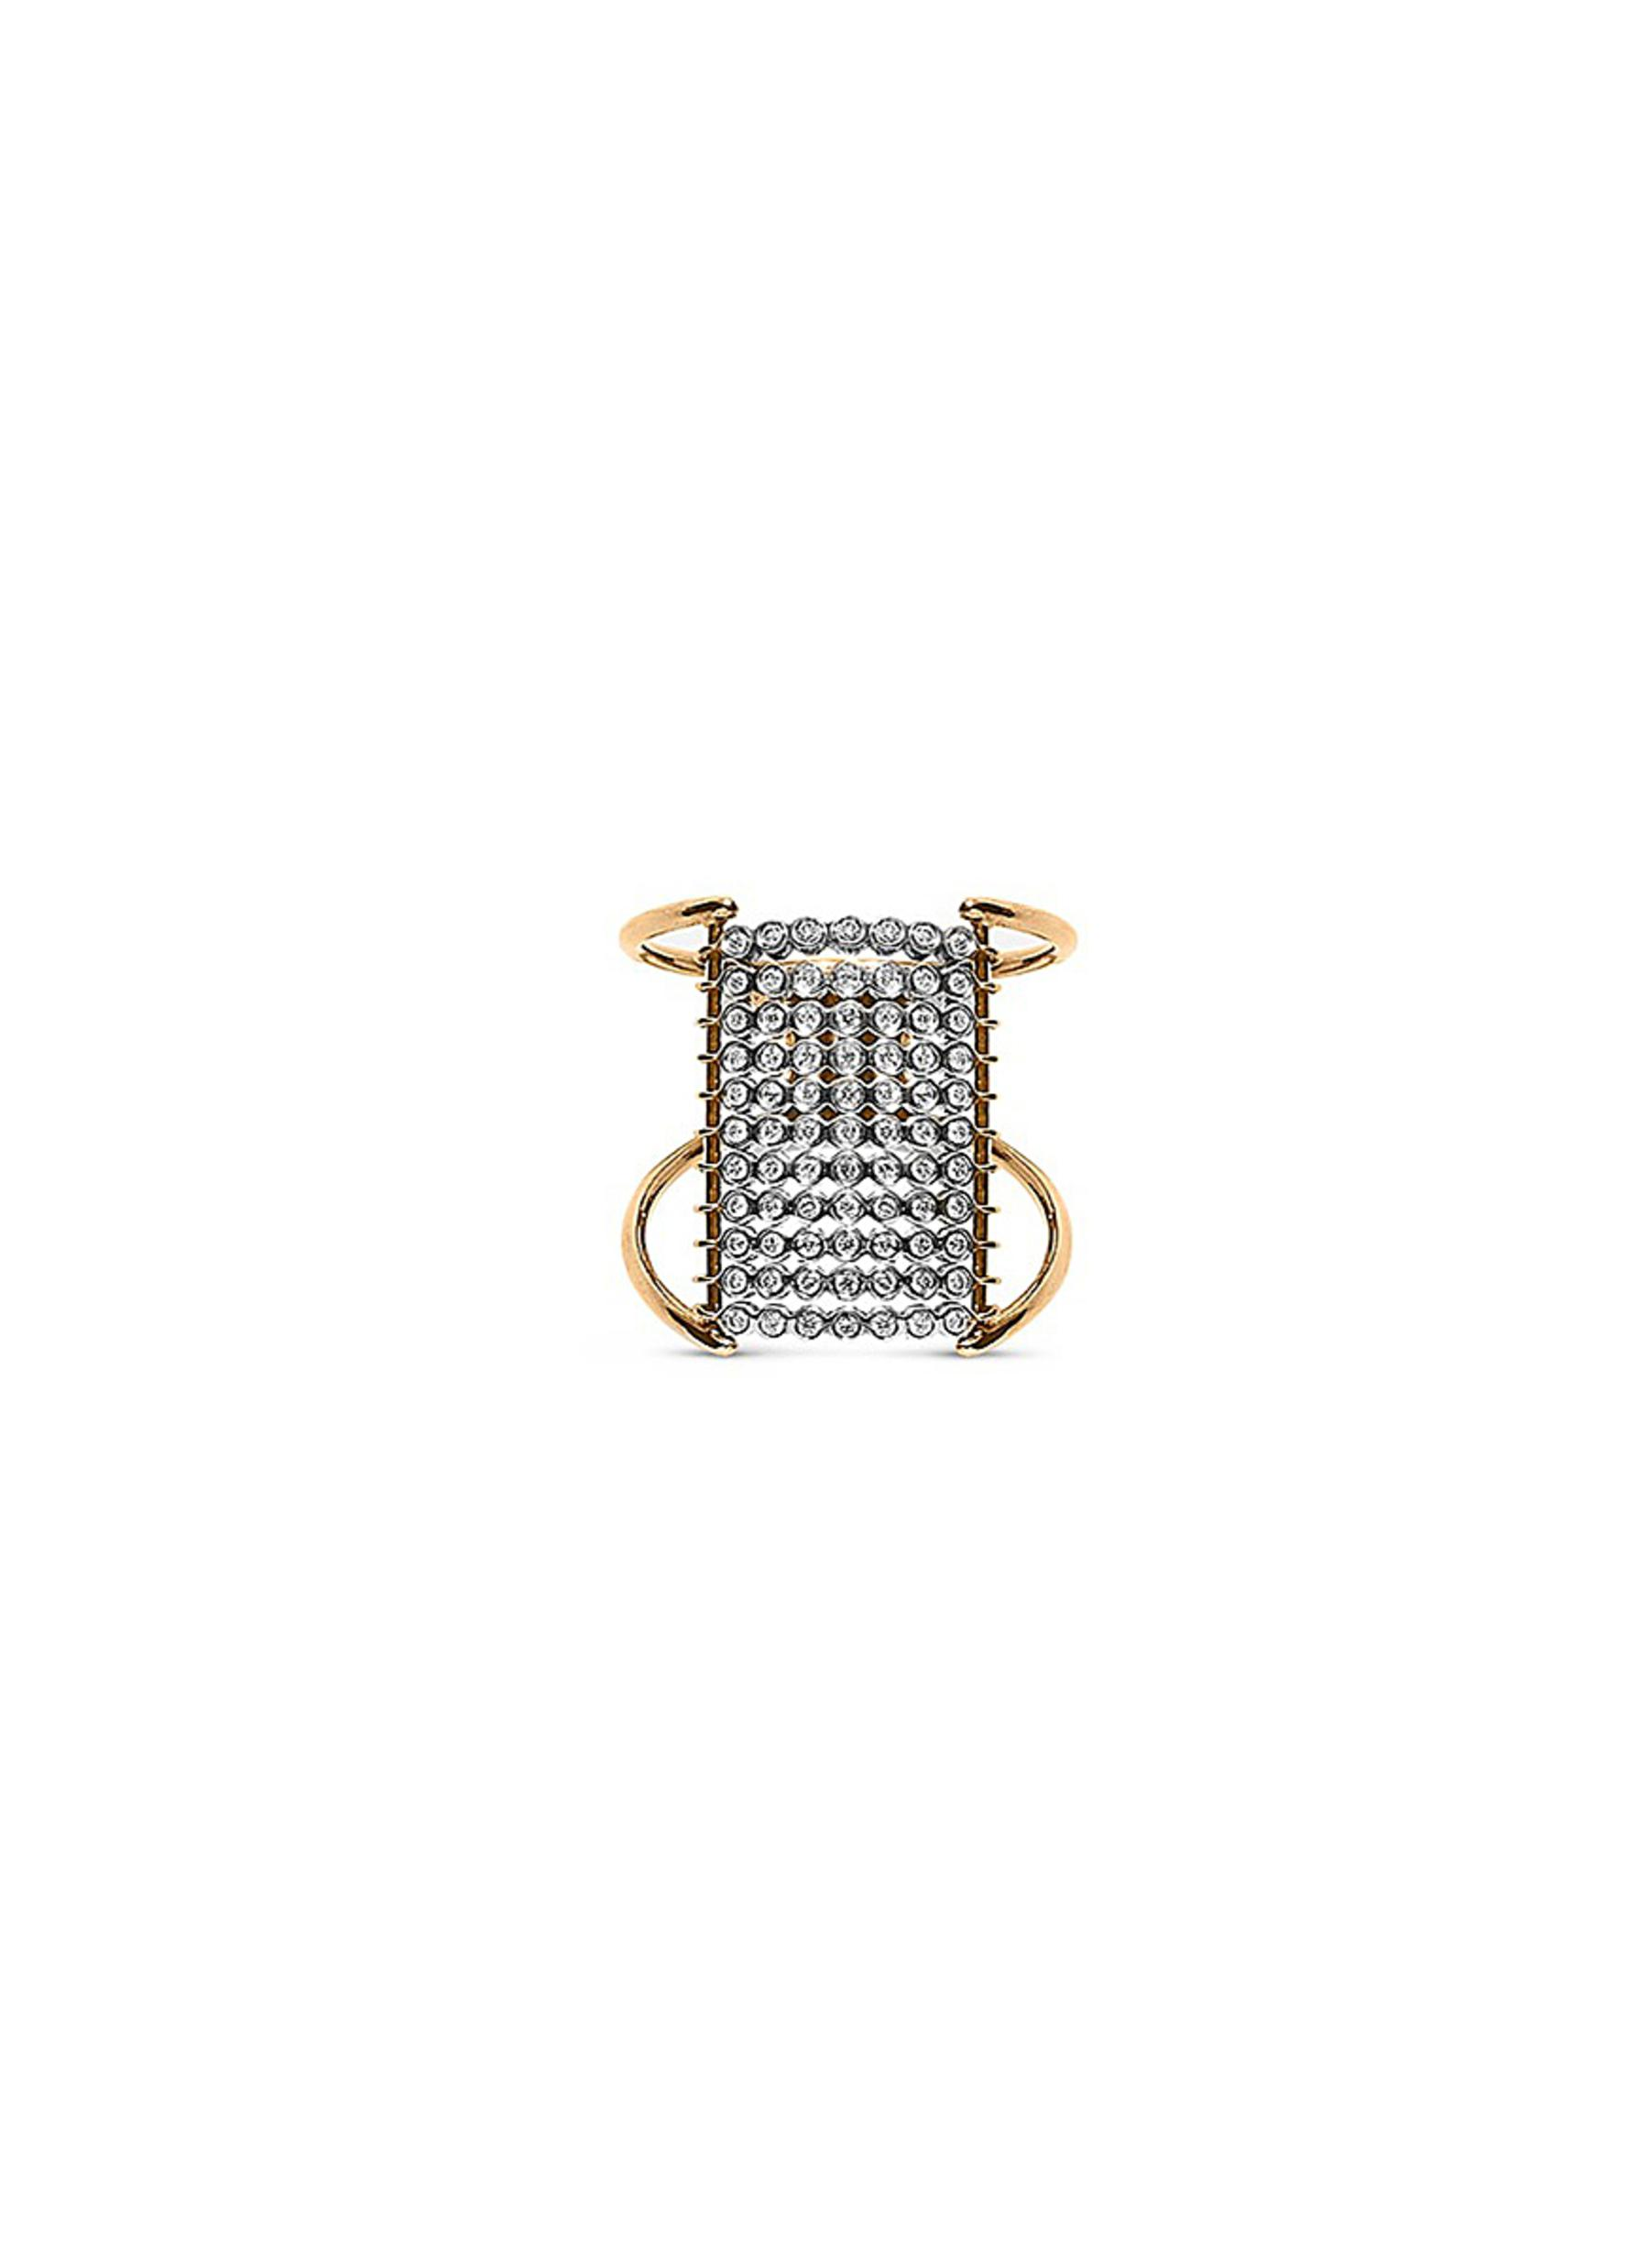 Charnières diamond 18k gold 11 tier ring by Yannis Sergakis Adornments